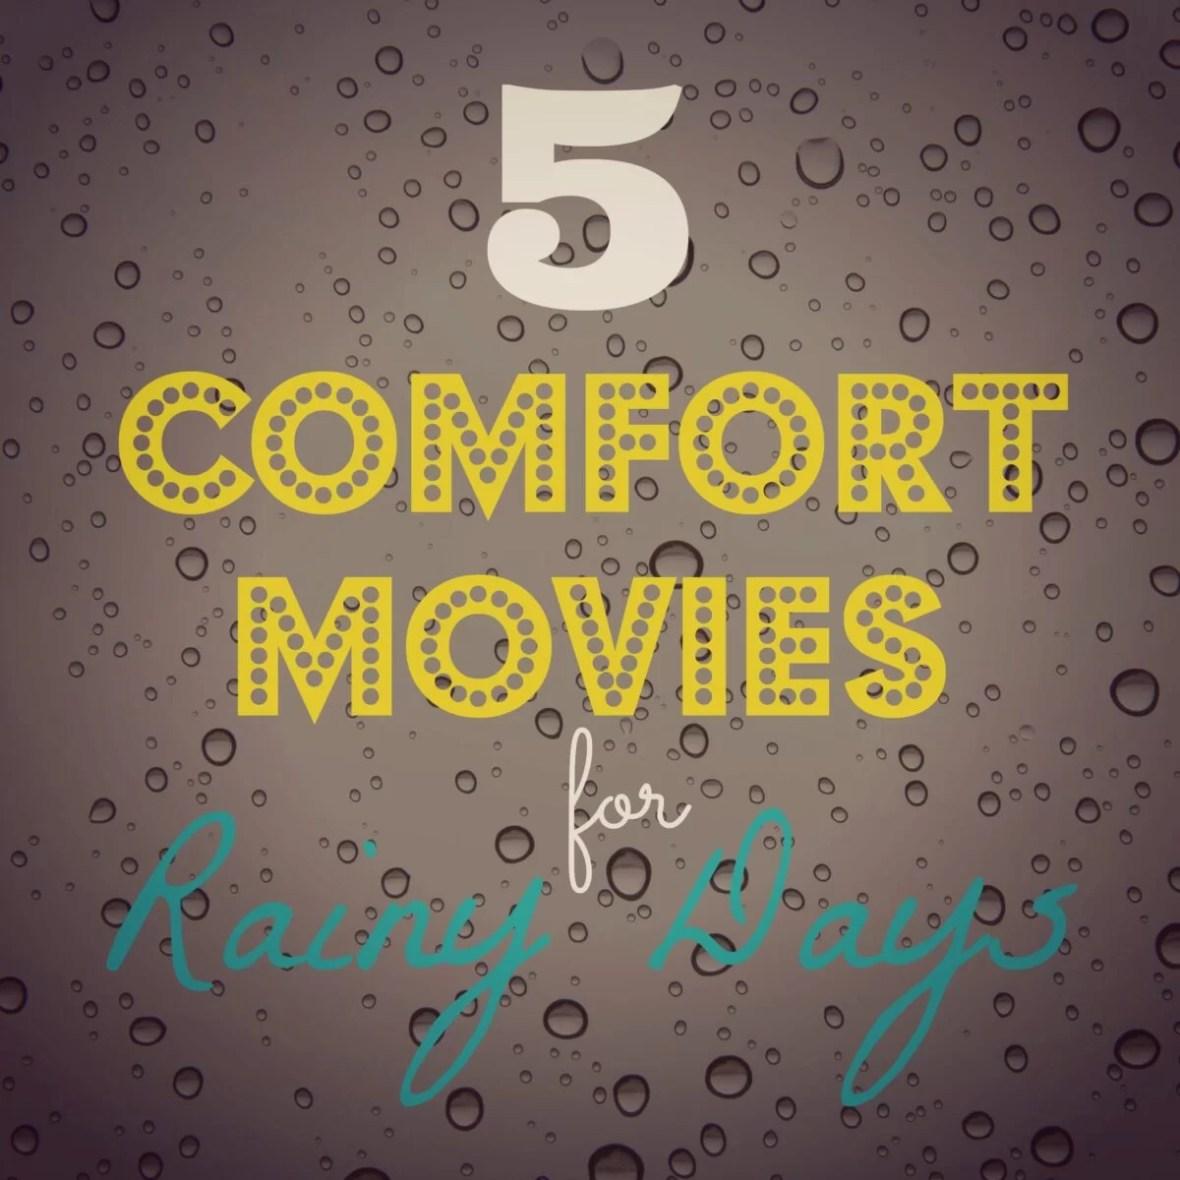 comfort movies pic